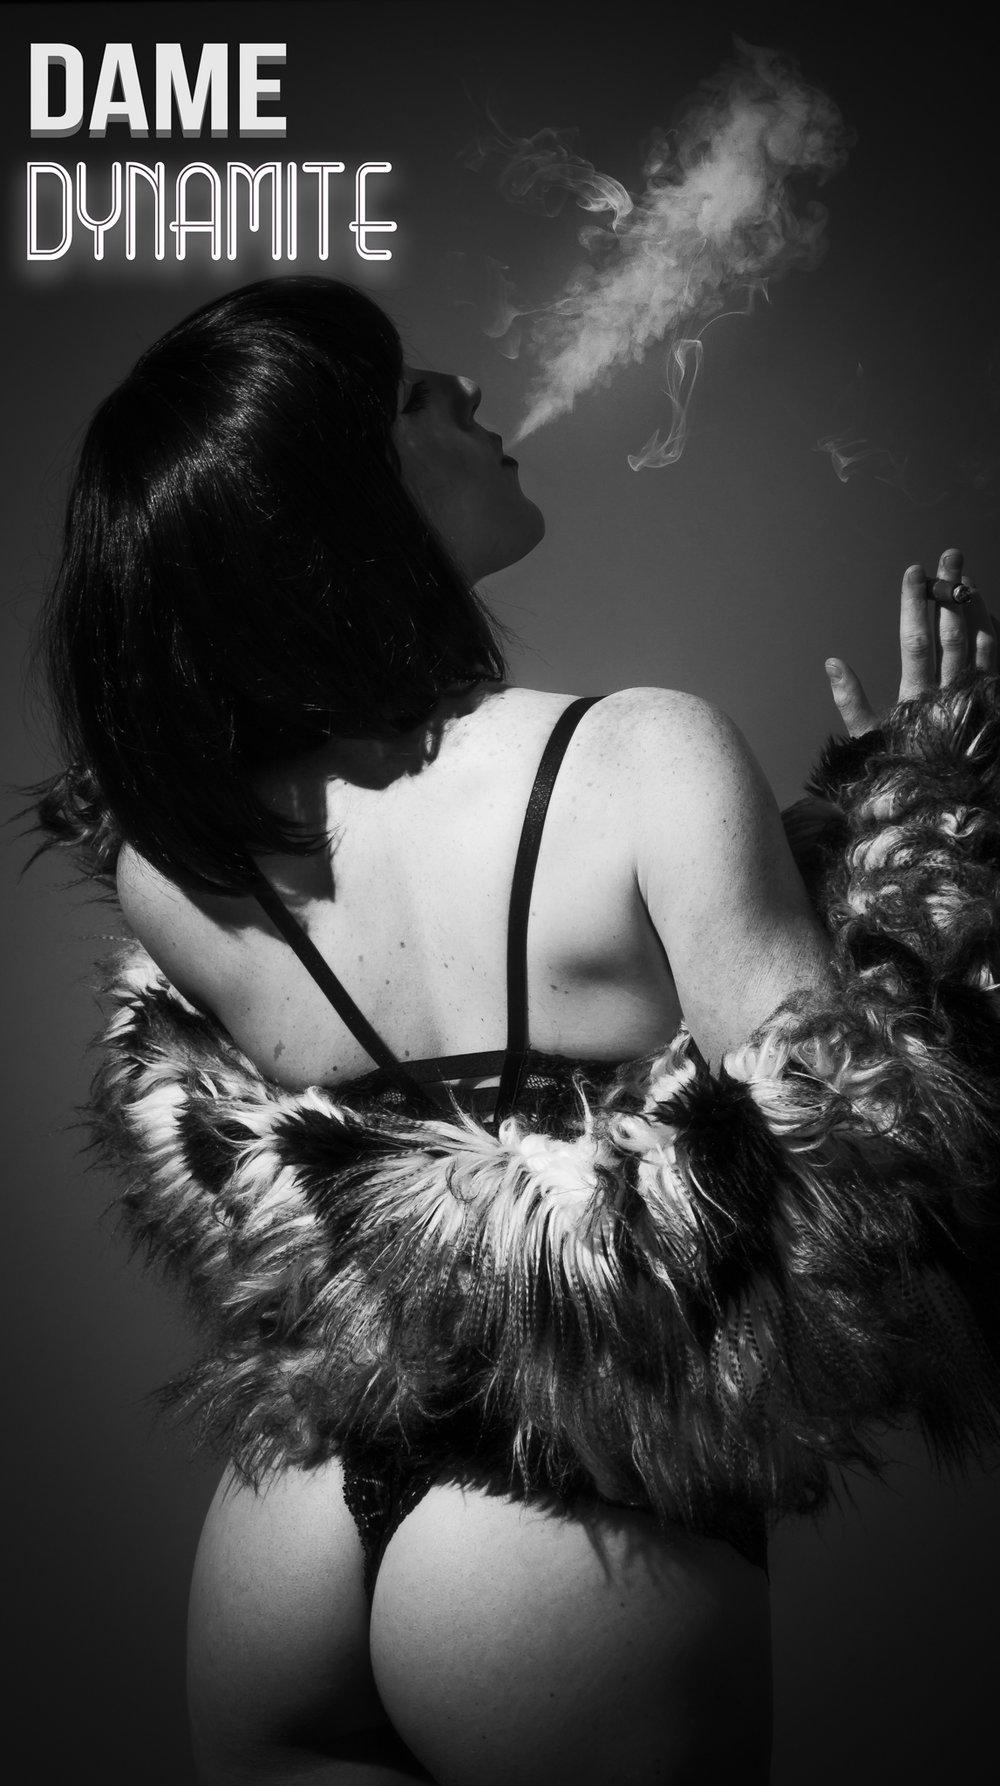 20160504-Esther-Dame-Dynamite-0931-2.jpg